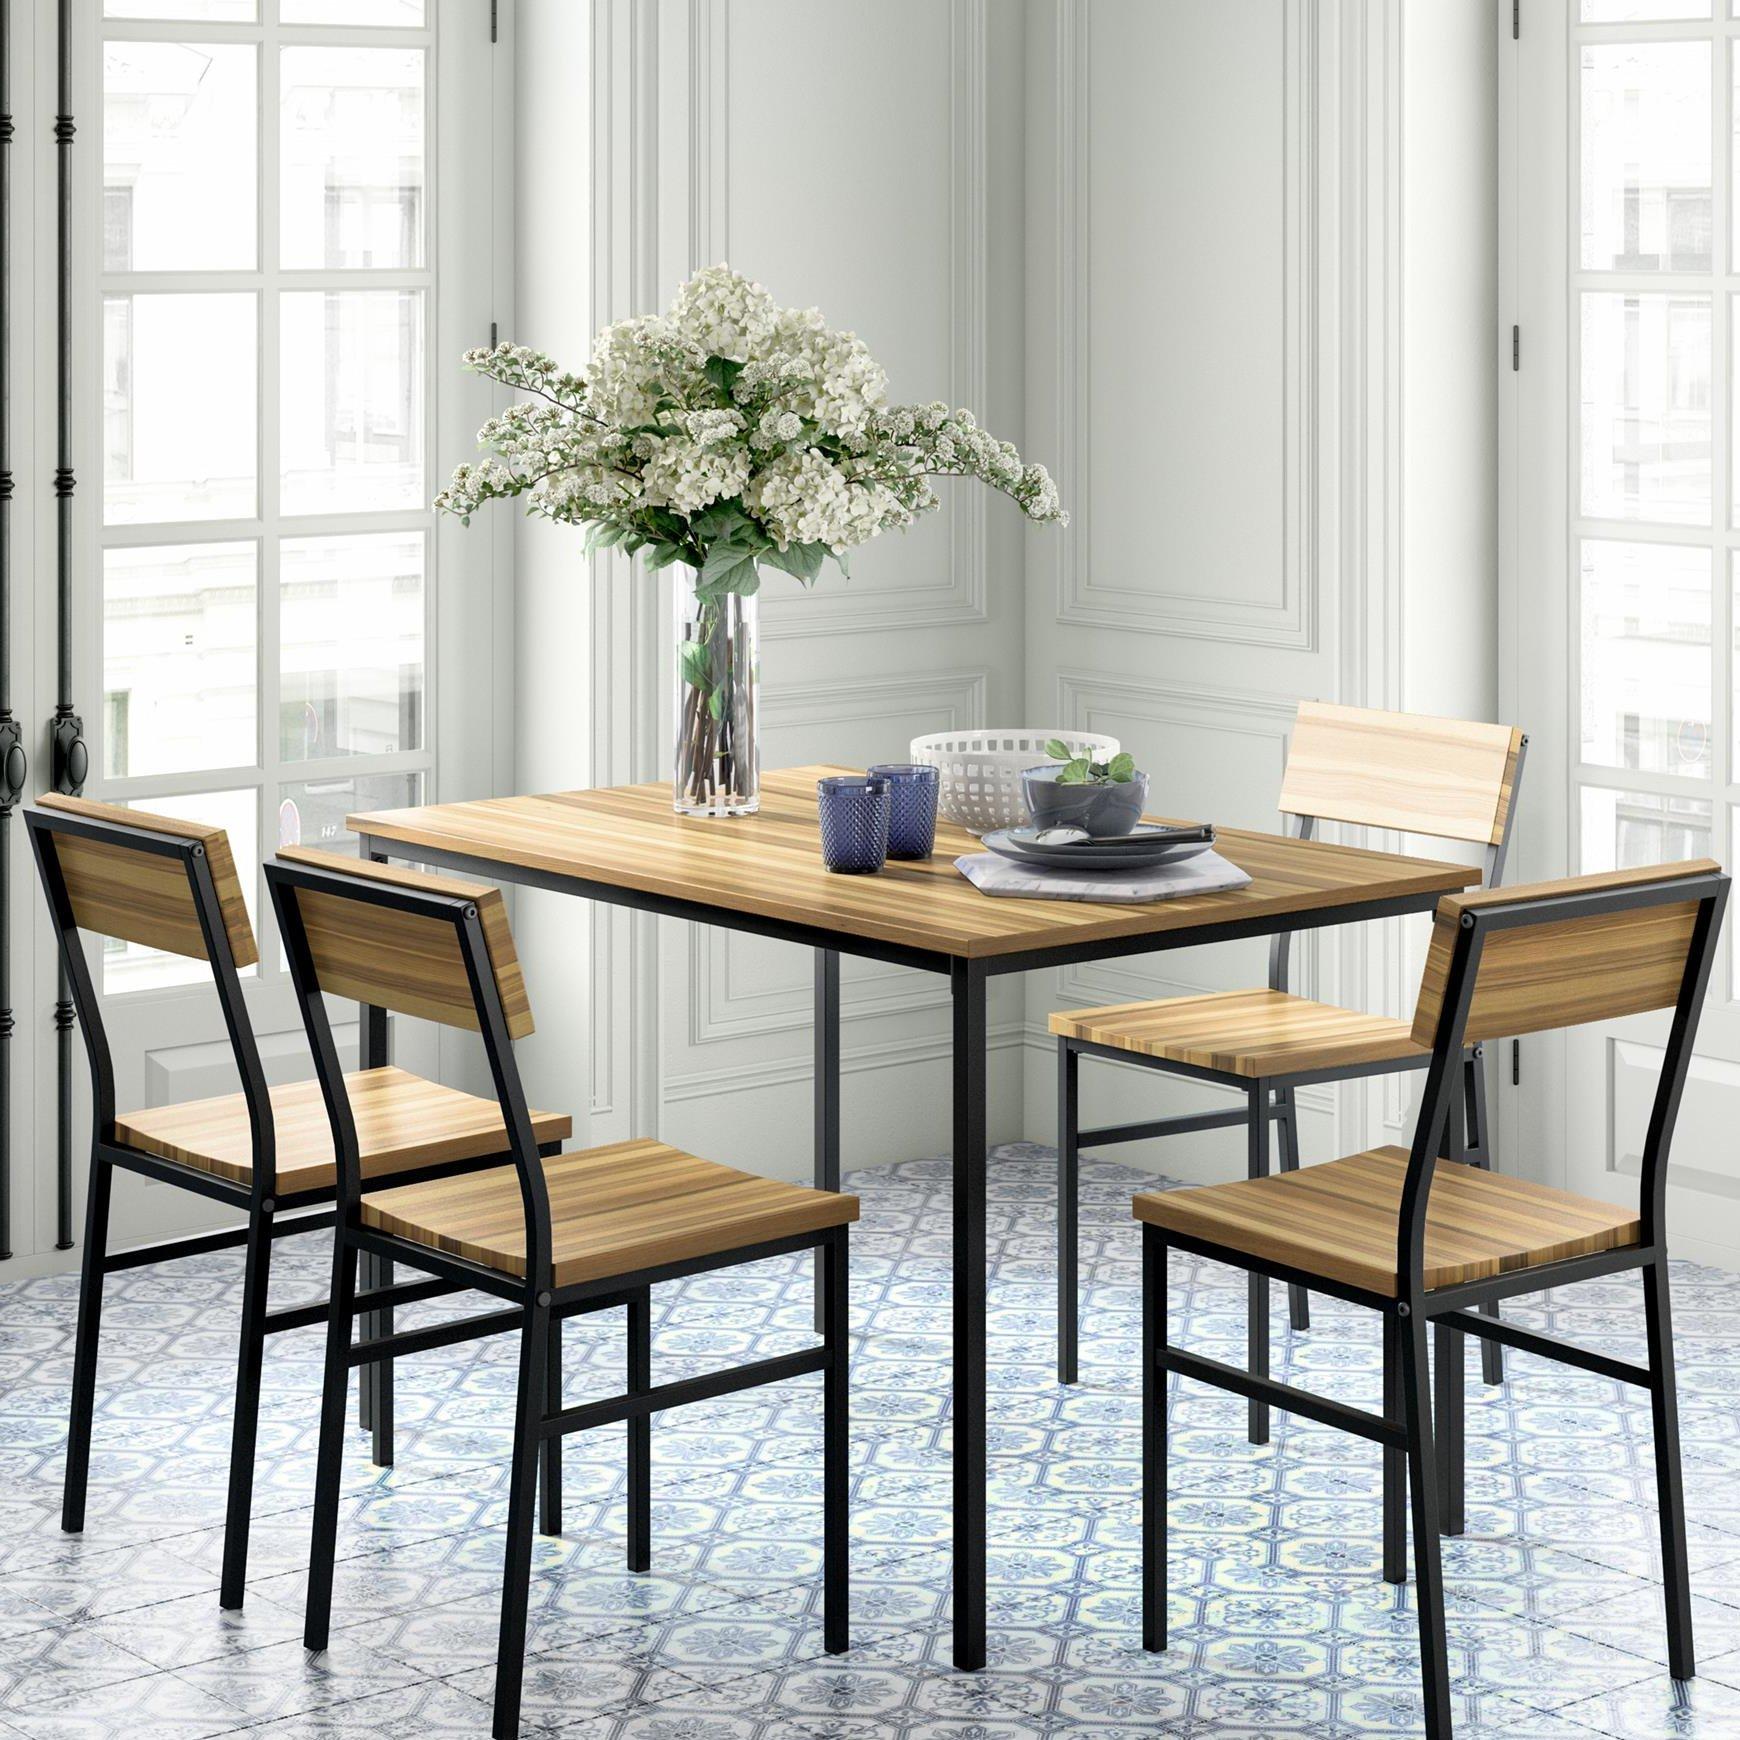 Novogratz Linden 5 Piece Dining Set | Wayfair (Image 13 of 20)